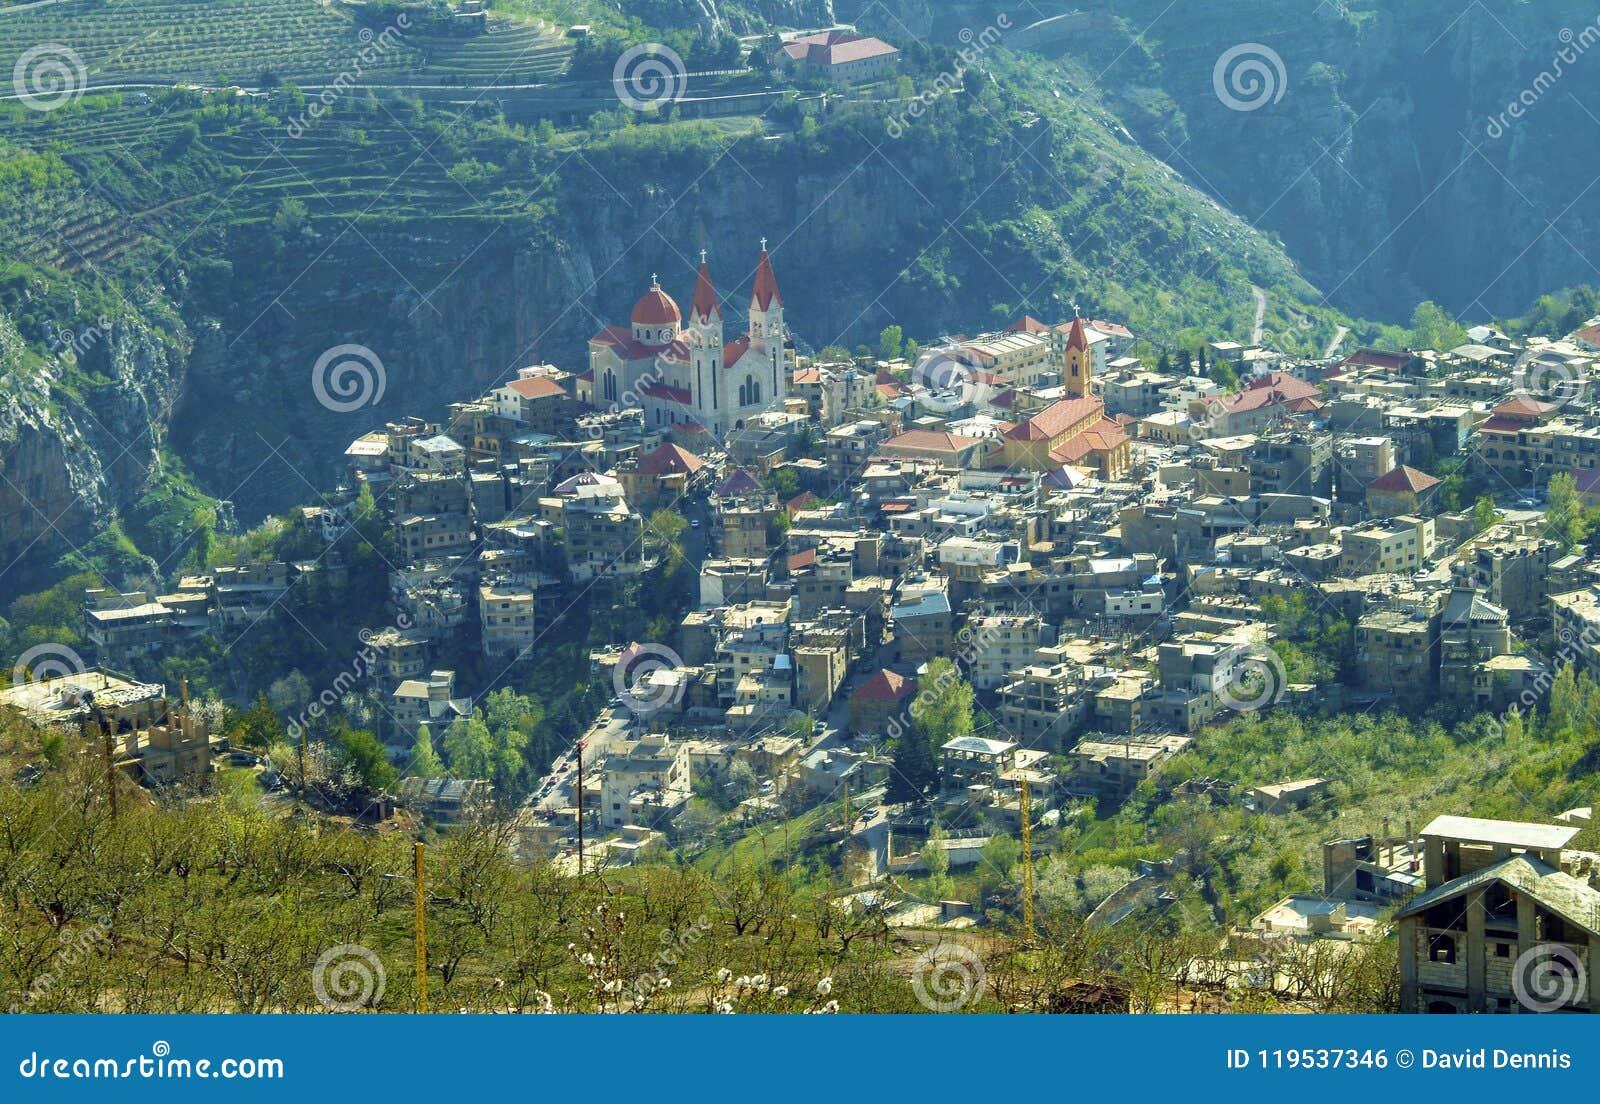 The beautiful mountain town of Bcharre in Lebanon